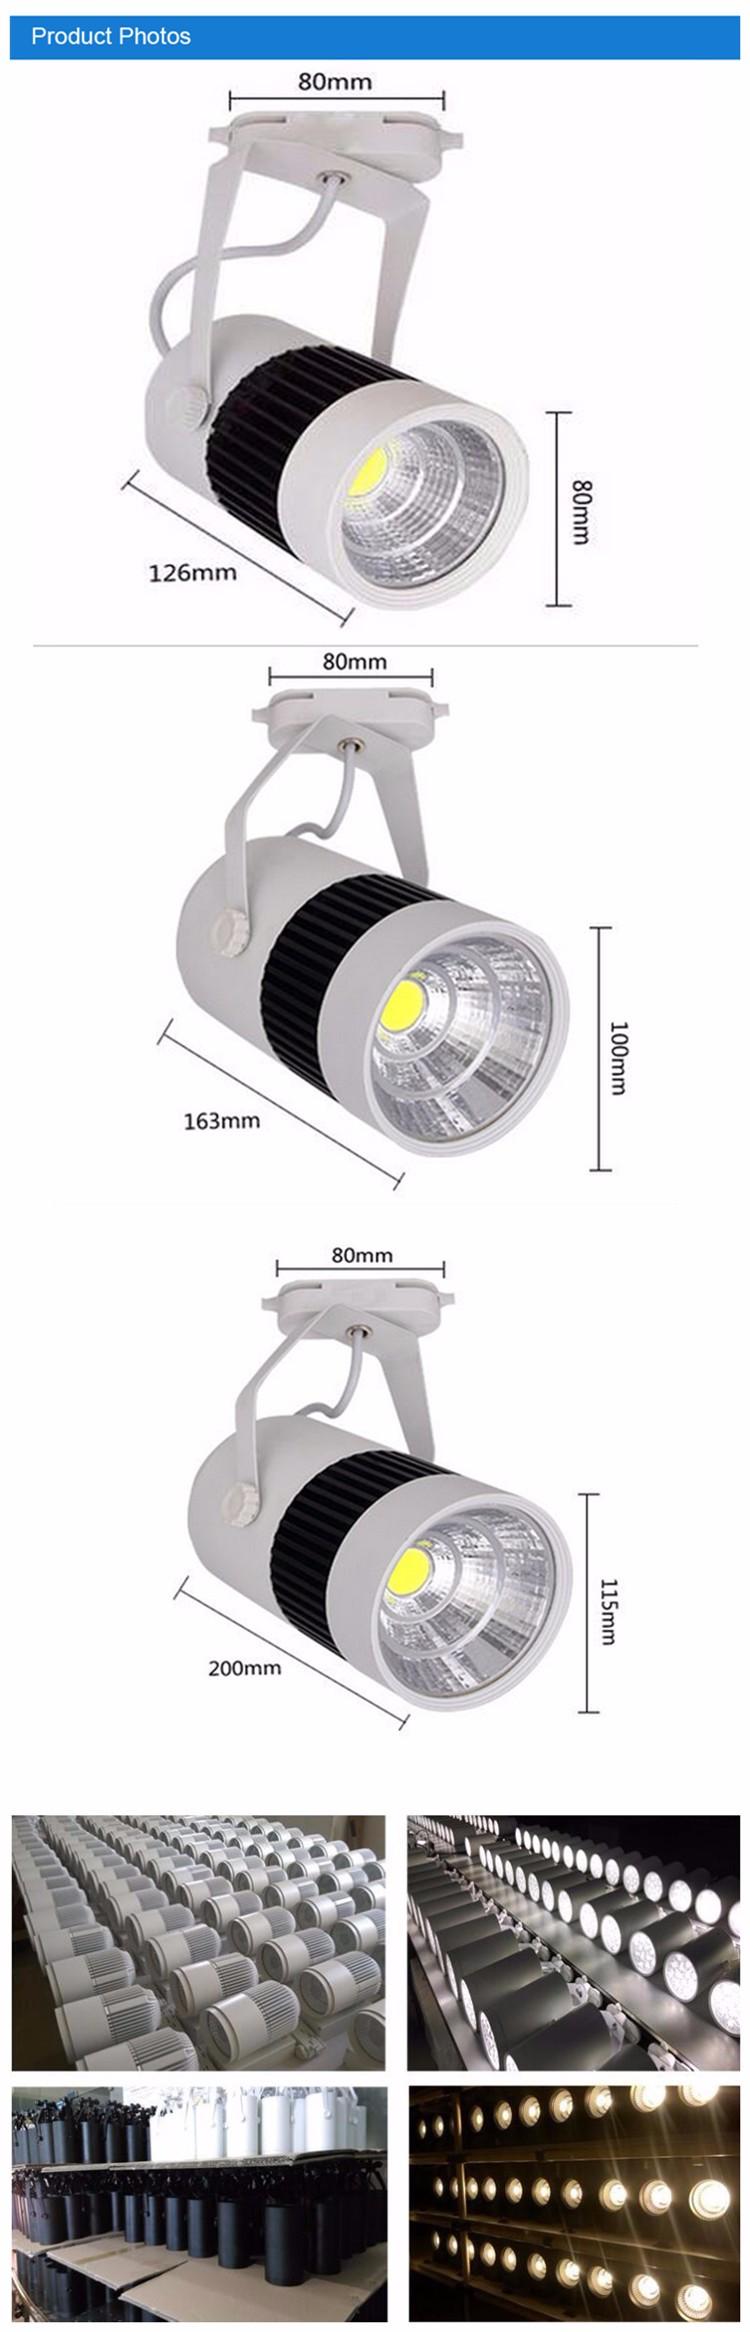 New Design Led Track Nail Light Rgb 30w Cob Wireless Led